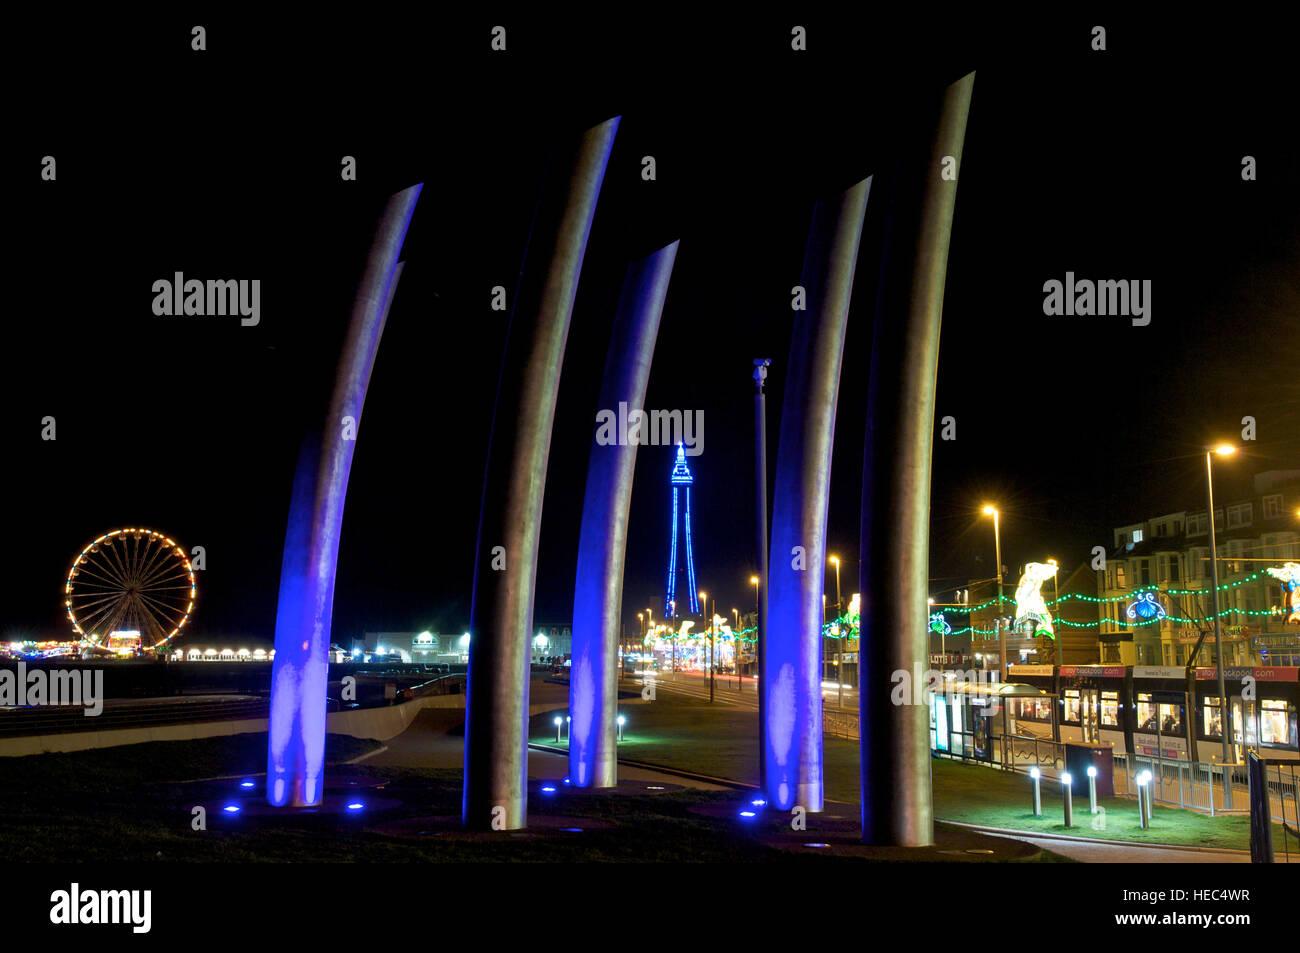 Blackpool annual illuminations - Stock Image